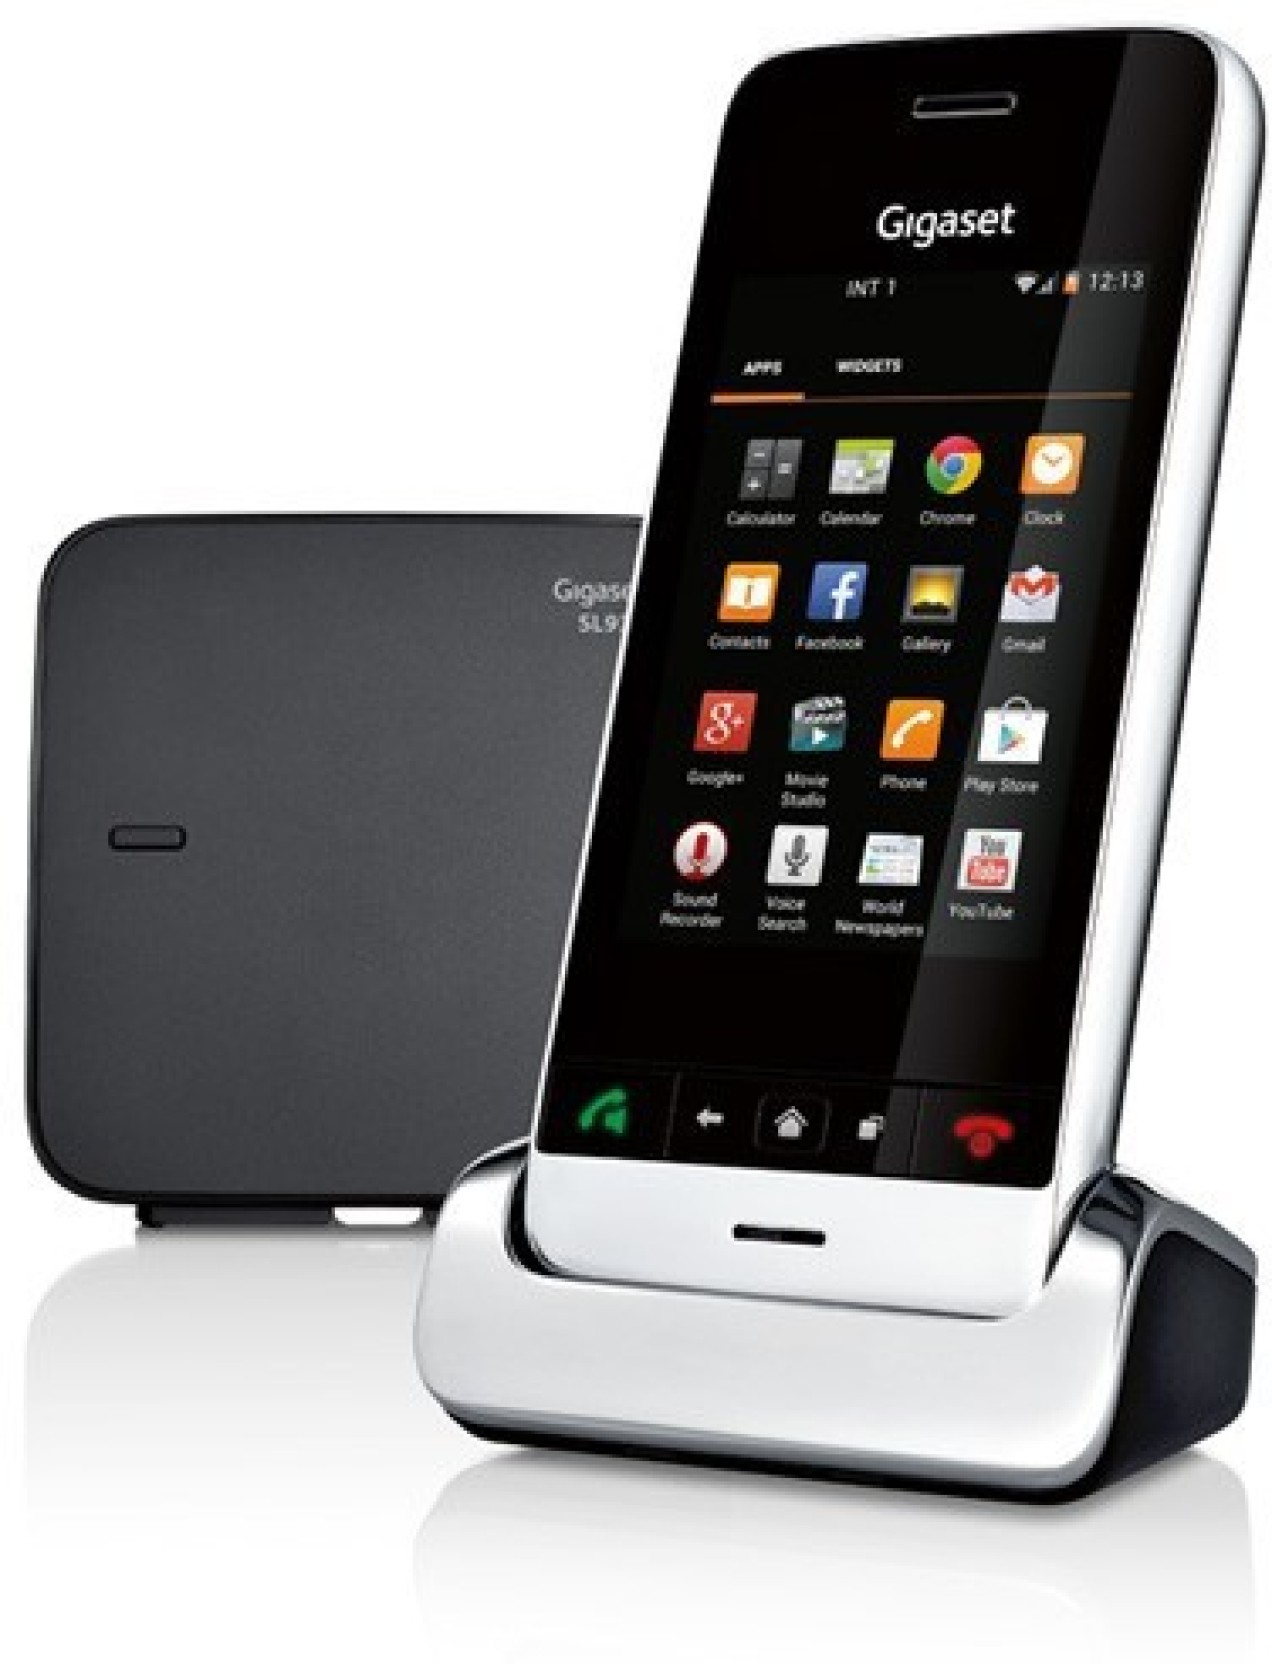 cordless landline phone with answering machine